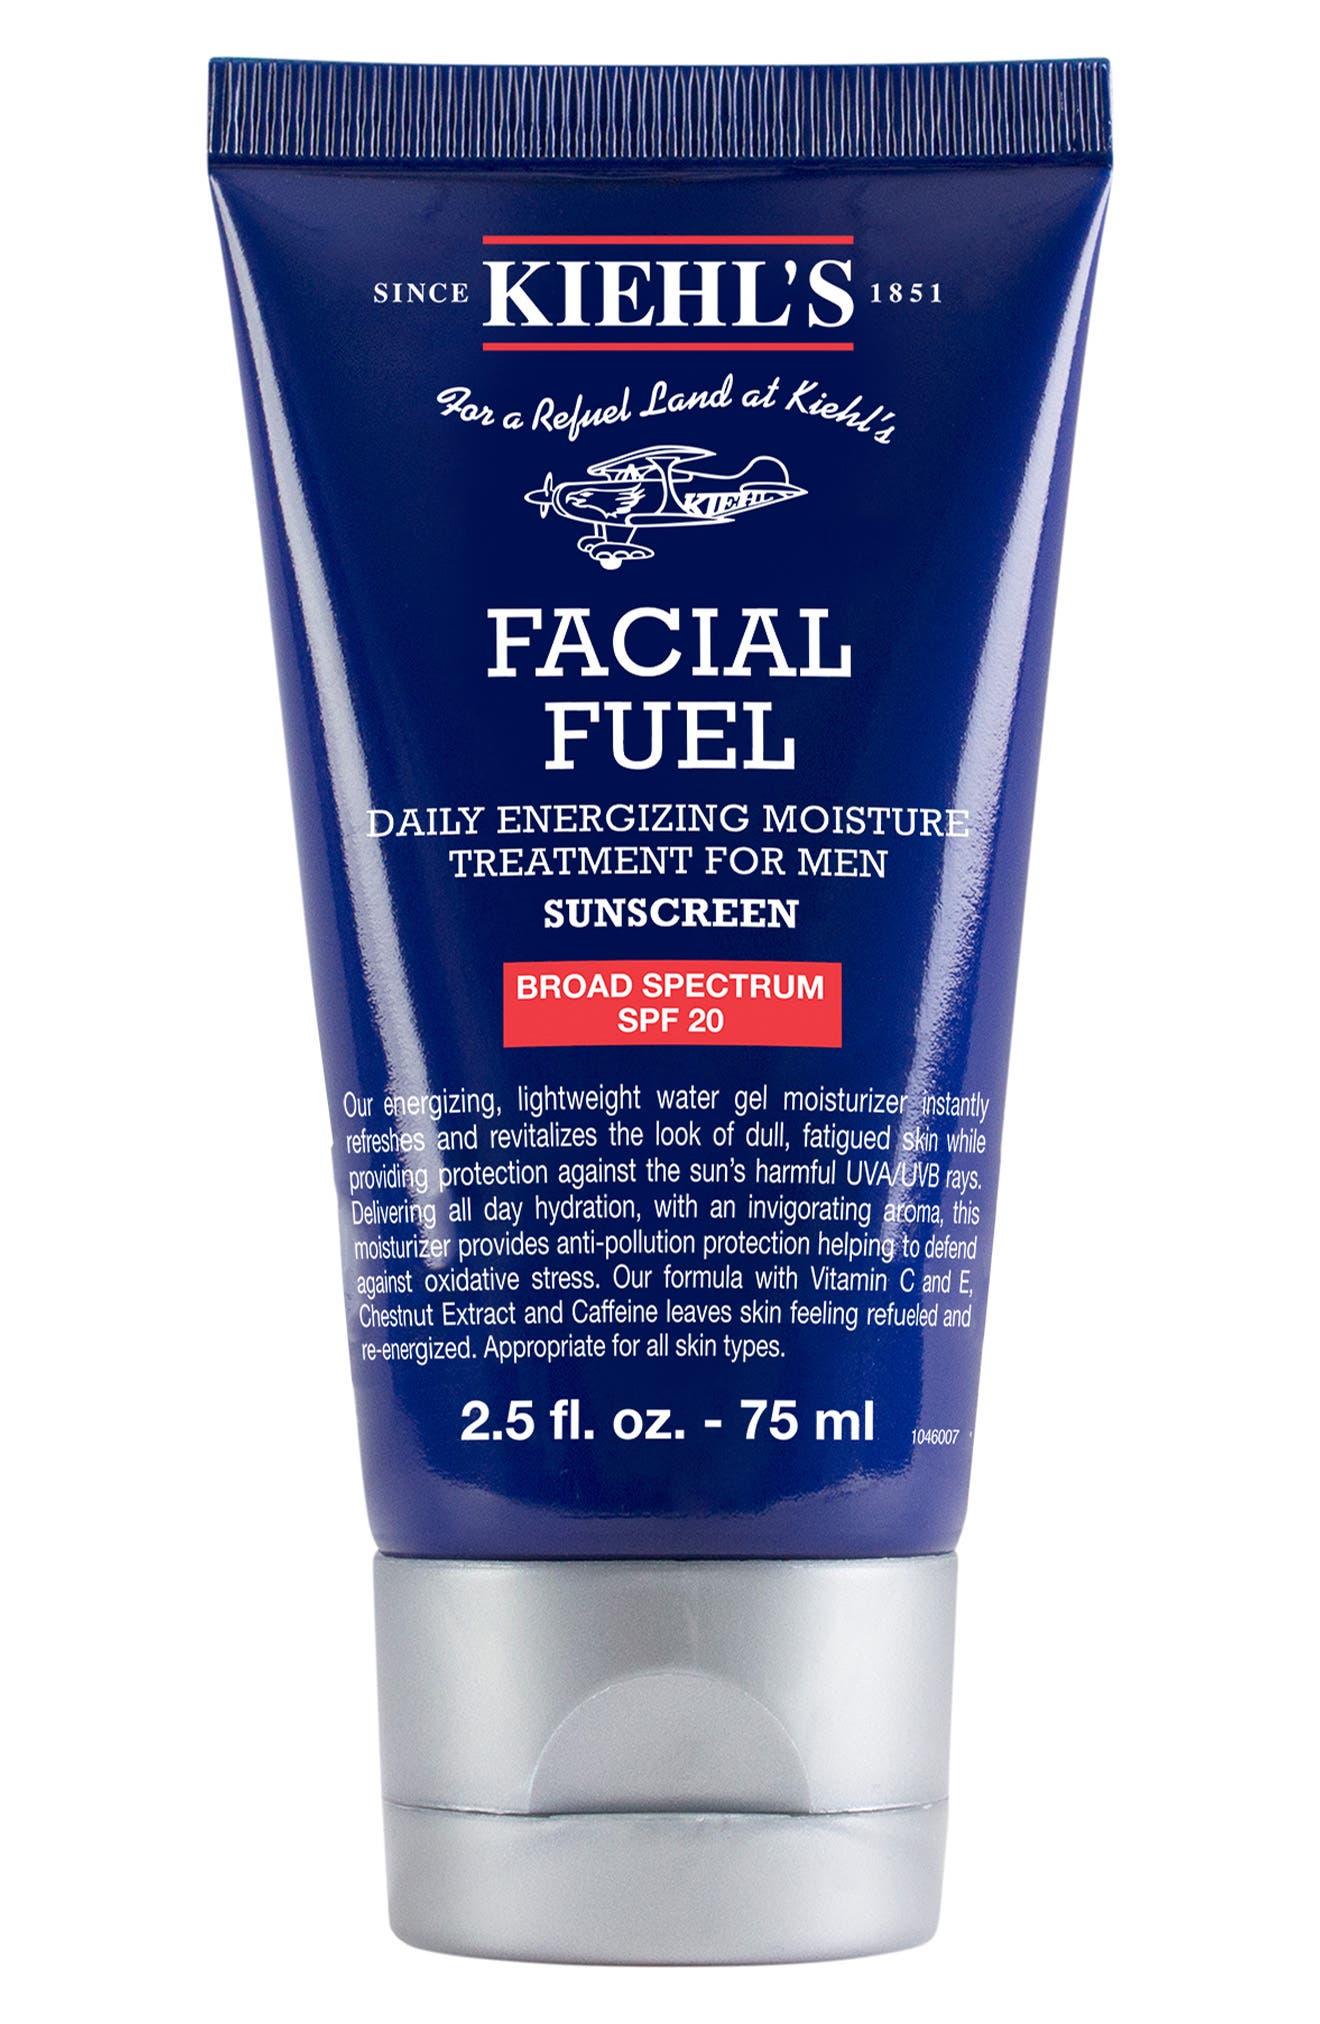 Facial Fuel Daily Energizing Moisture Treatment for Men SPF 20, Main, color, NO COLOR